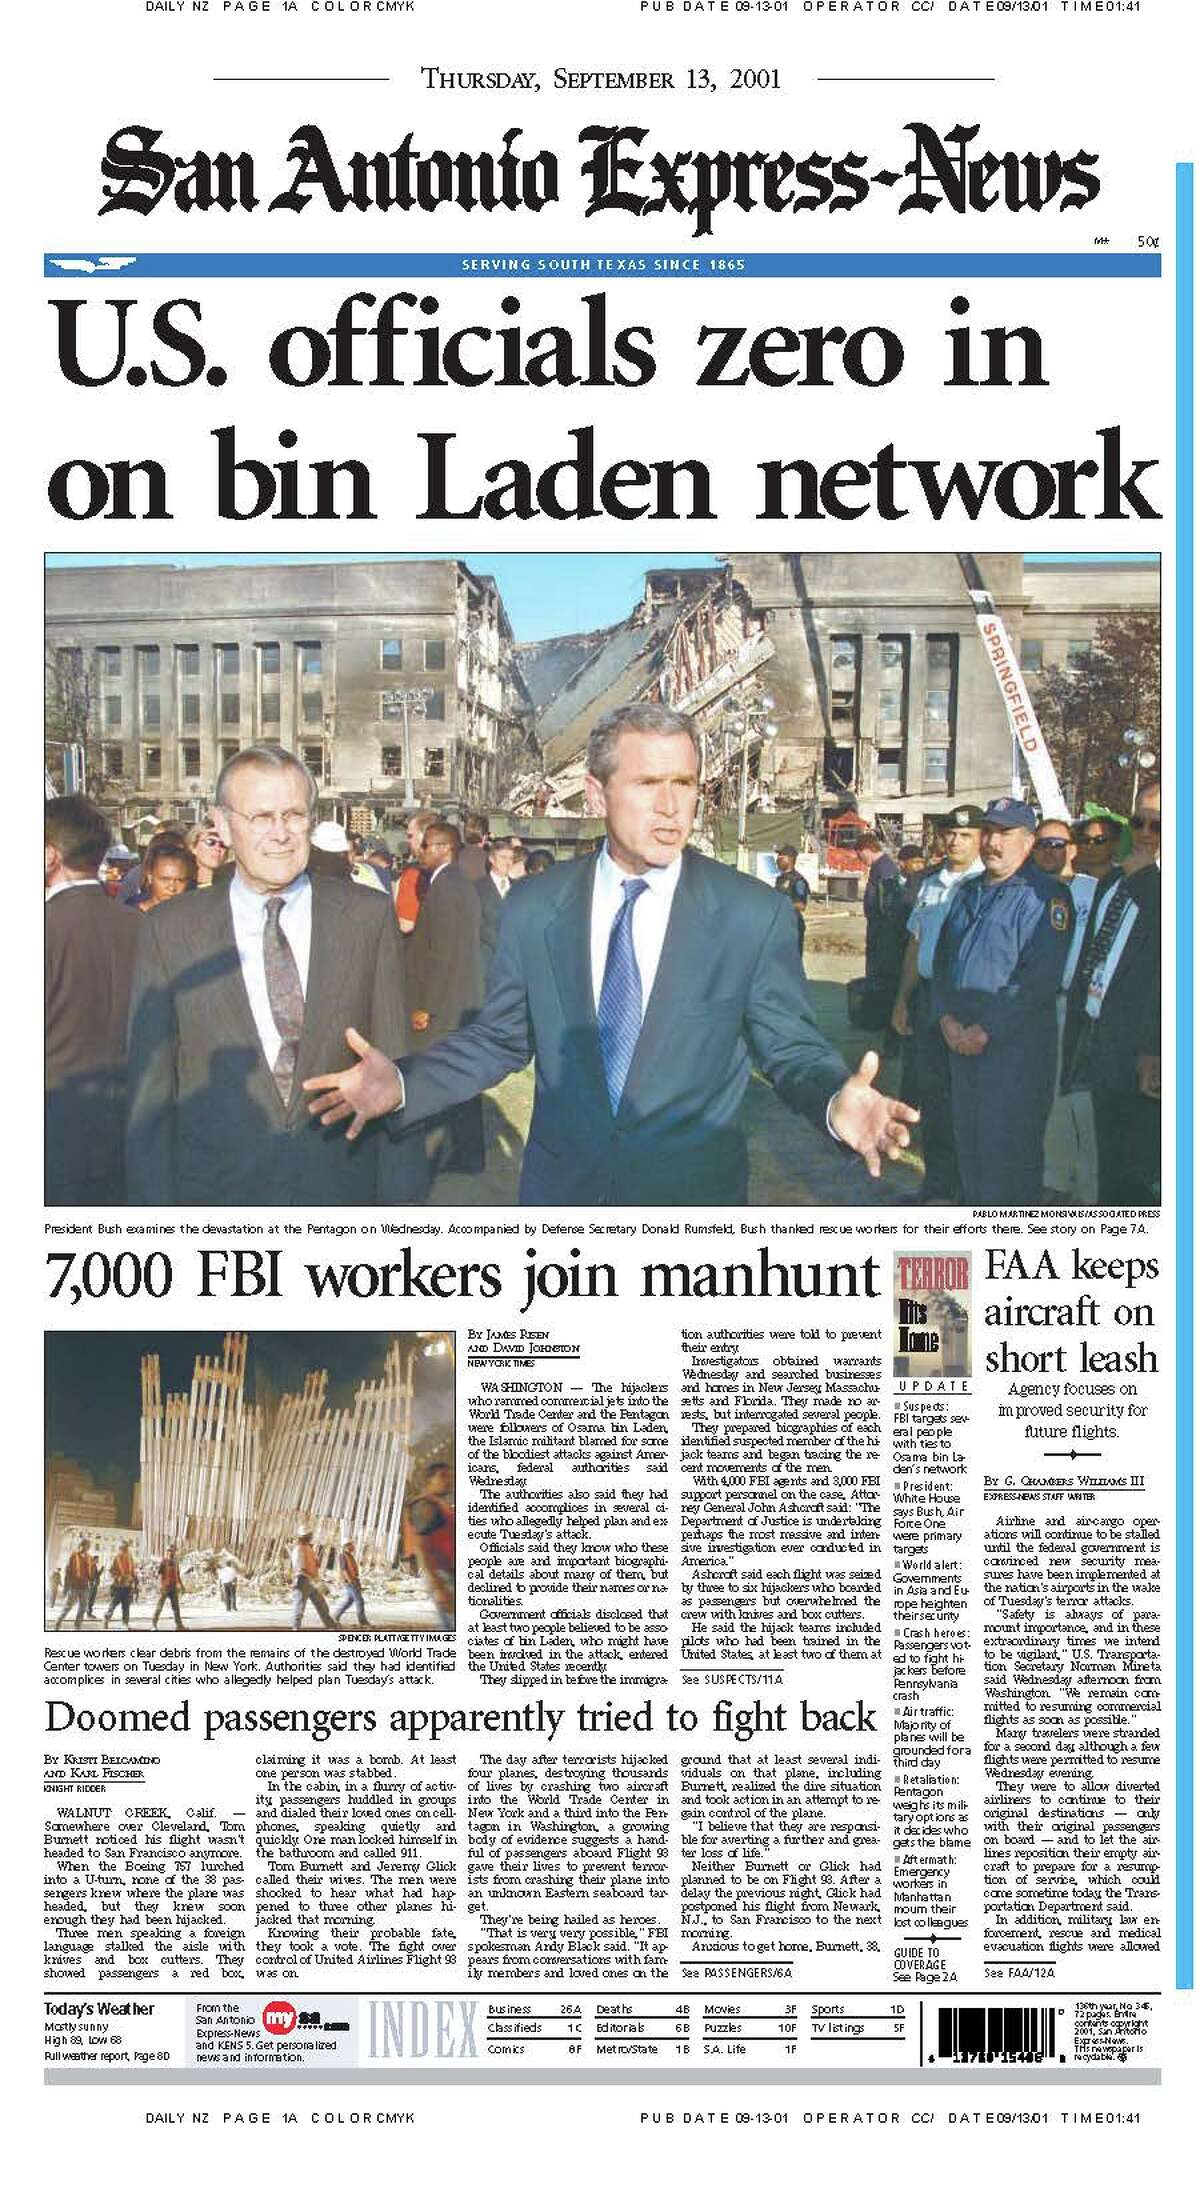 Sept. 13, 2001